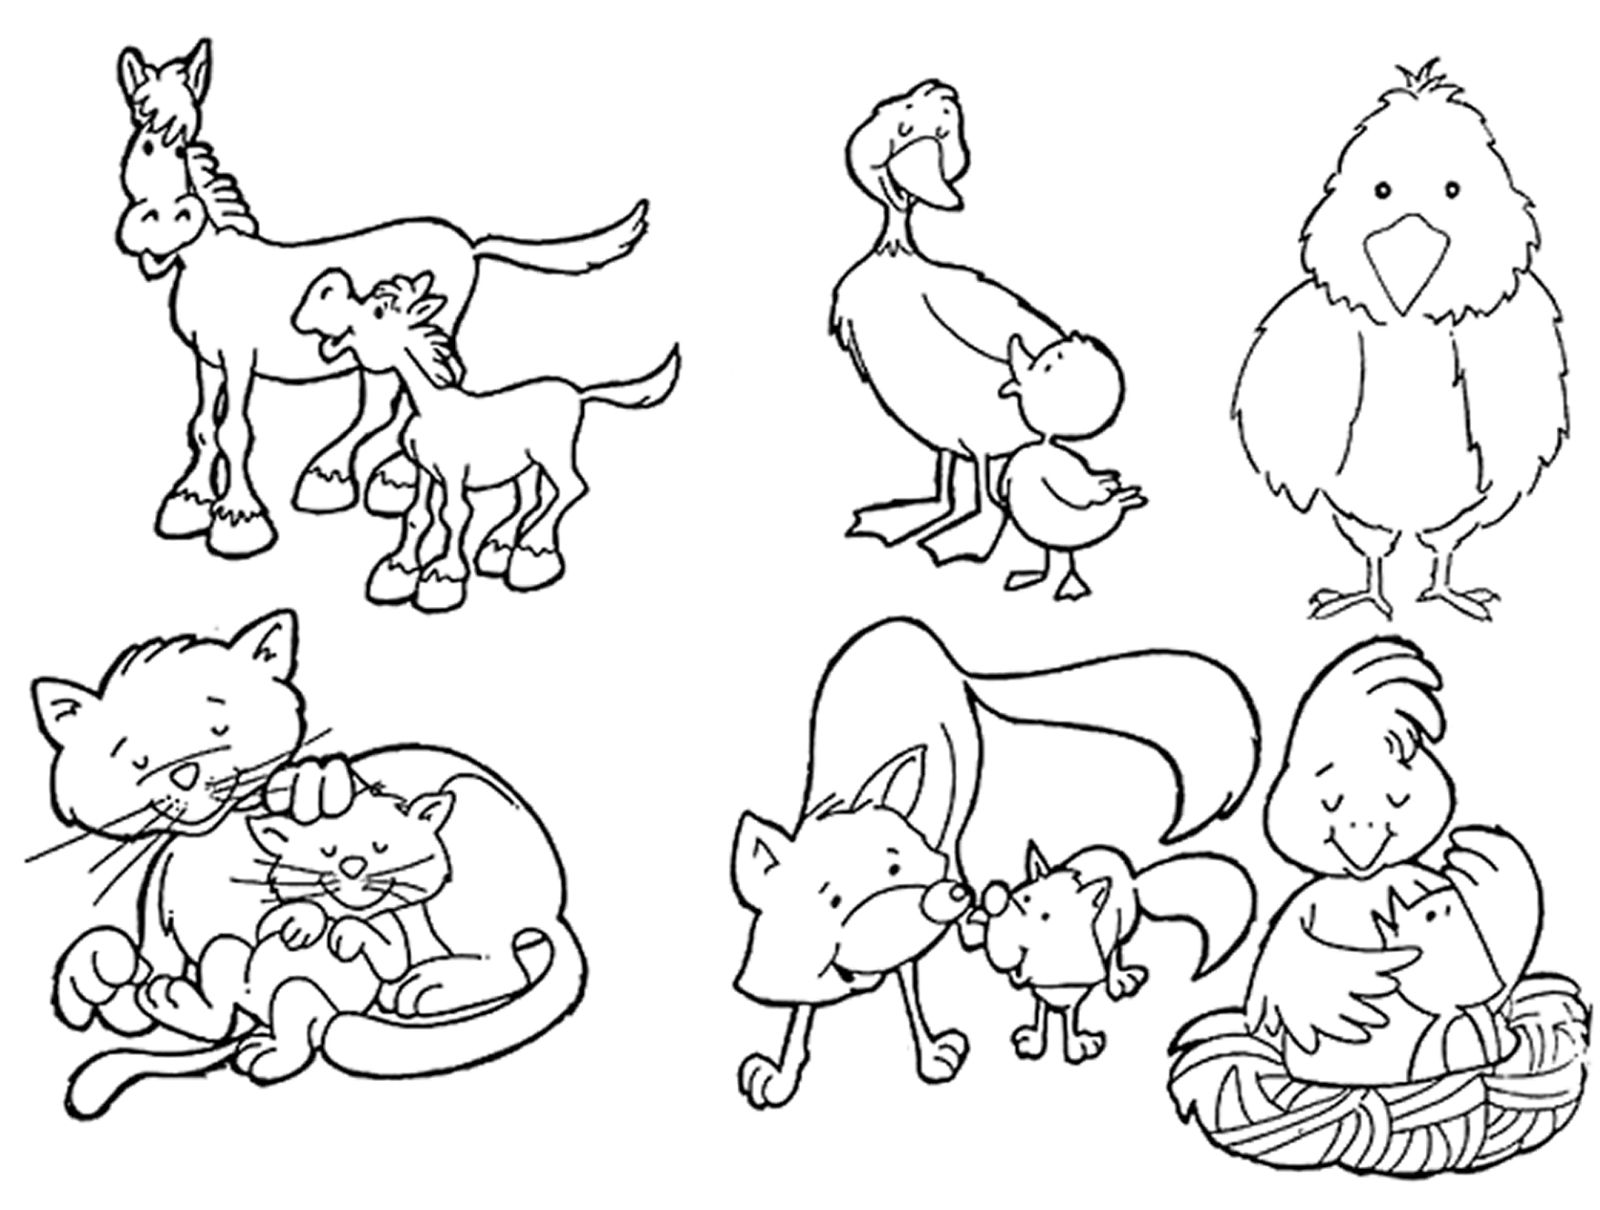 Animales Oviparos Y Viviparos Para Pintar Imagui